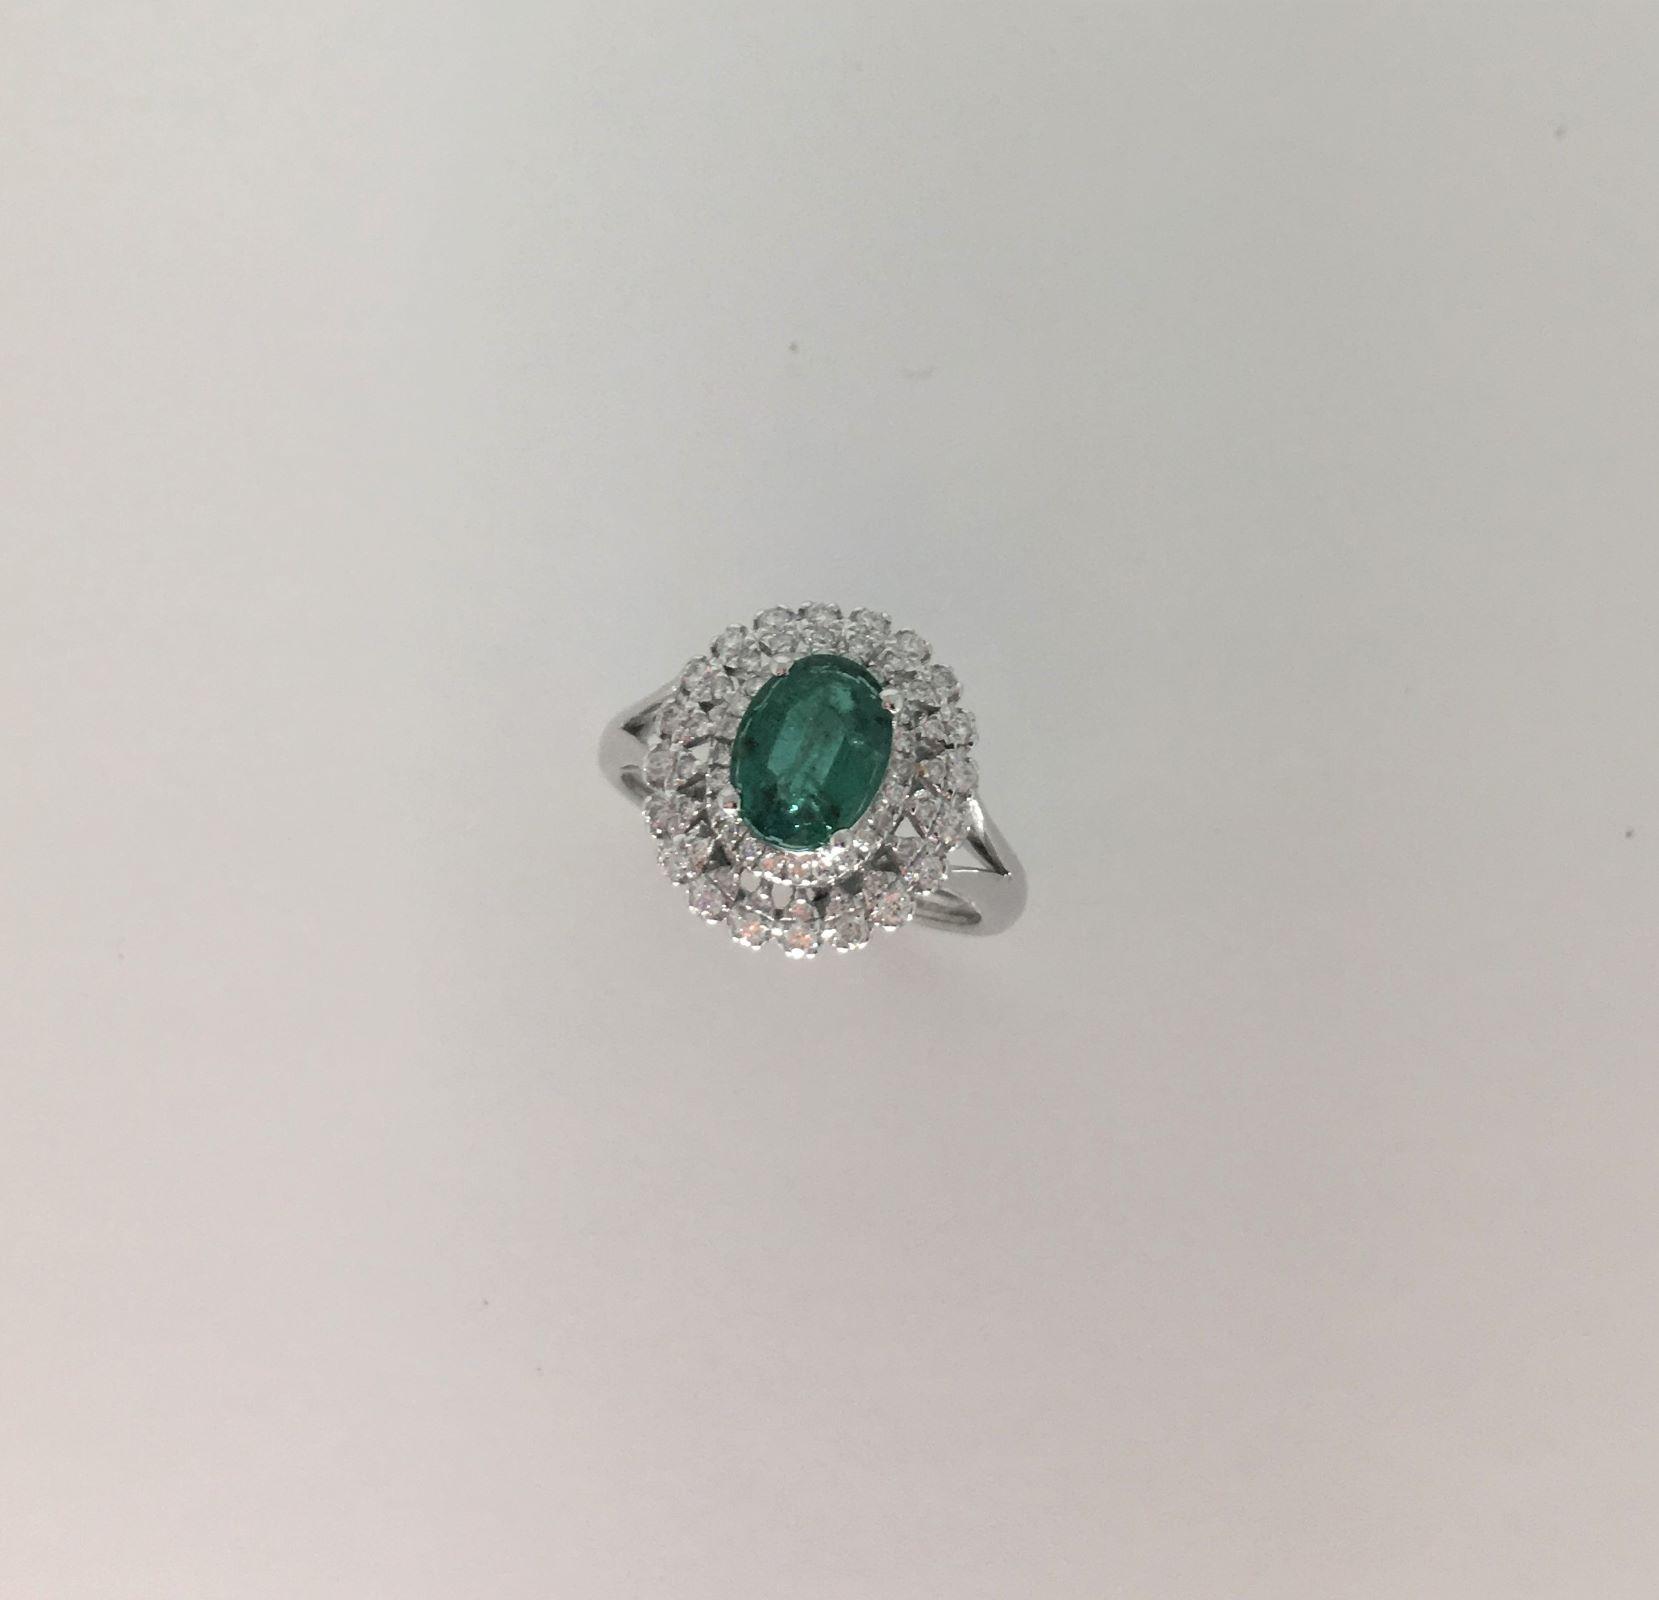 1 Carat Emerald Diamond Ring